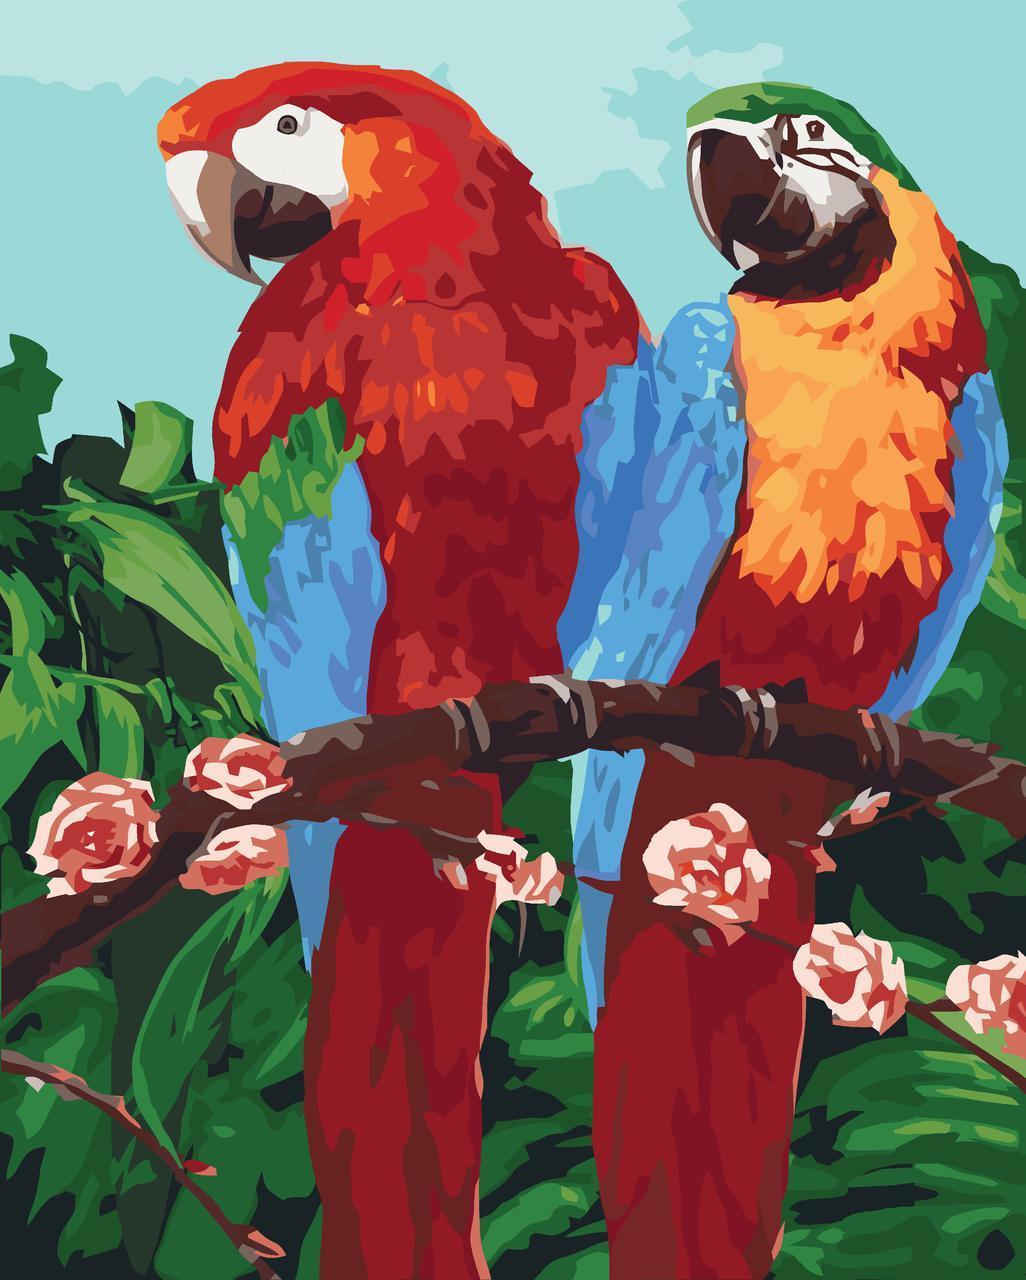 Картина по номерам Королевские попугаи 40 х 50 см (KHO4051)